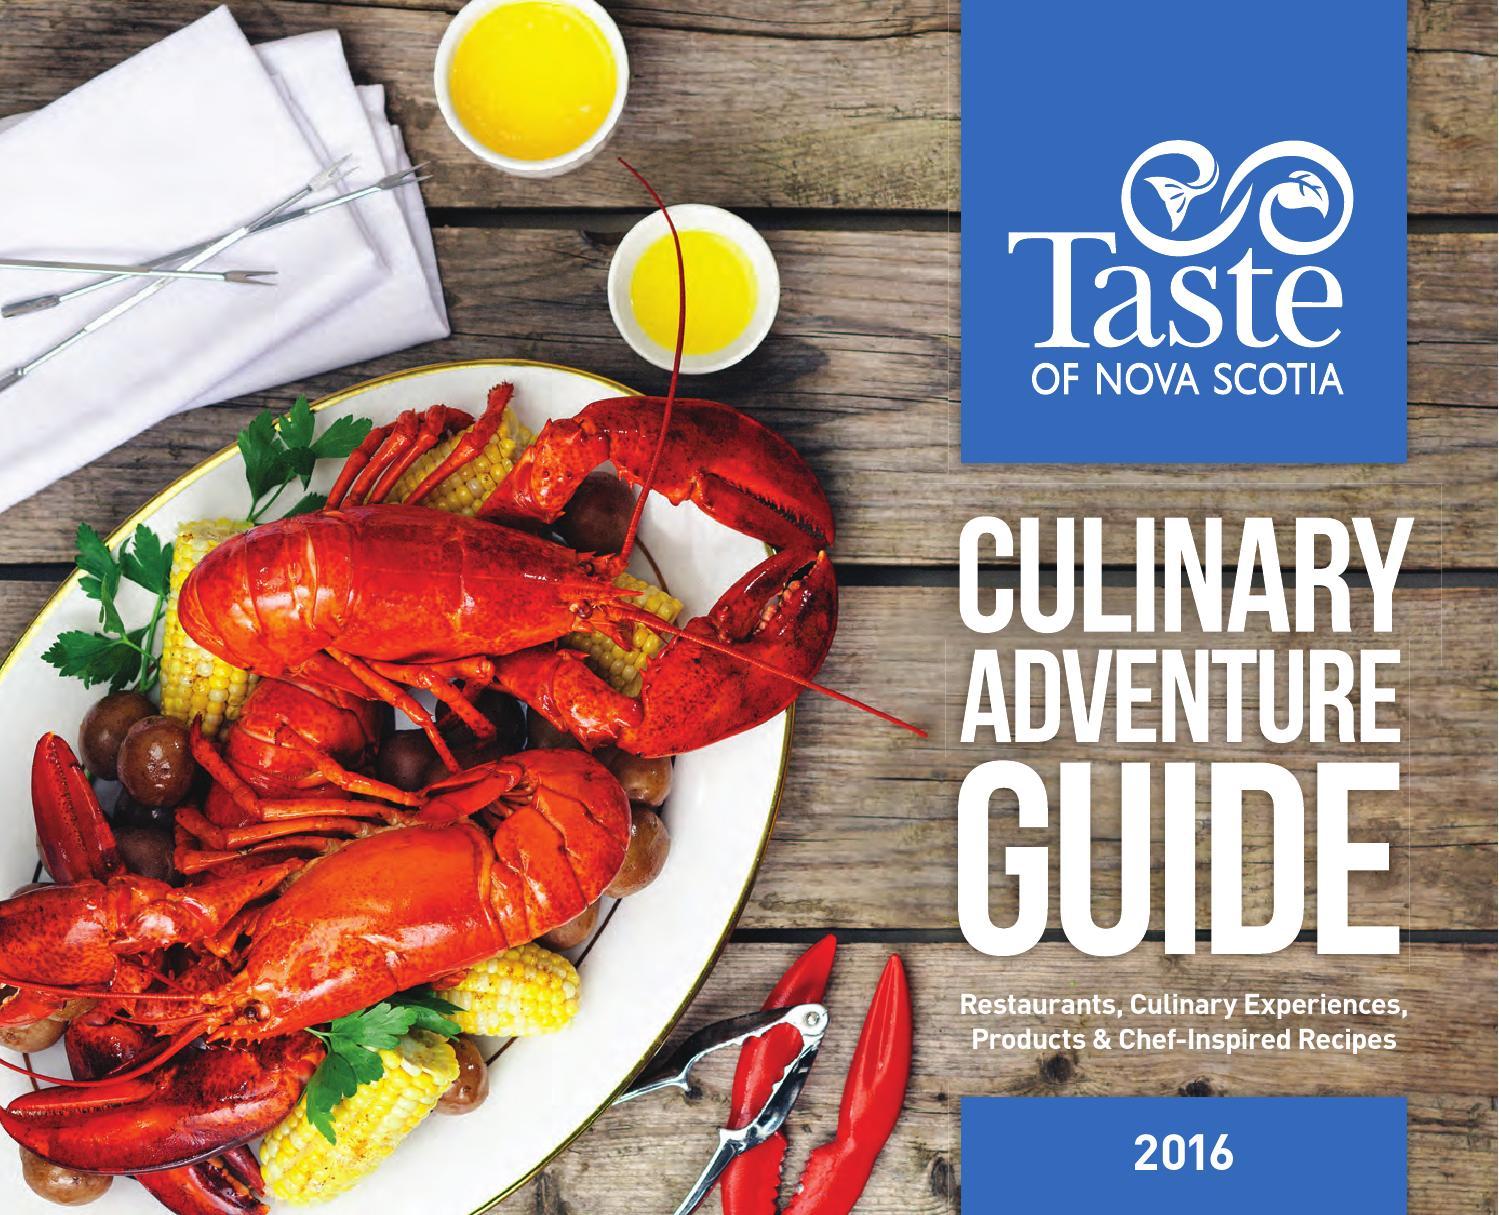 Red Lobster Lincoln Ne 2016 Taste Of Nova Scotia Culinary Adventure Guide By Taste Of